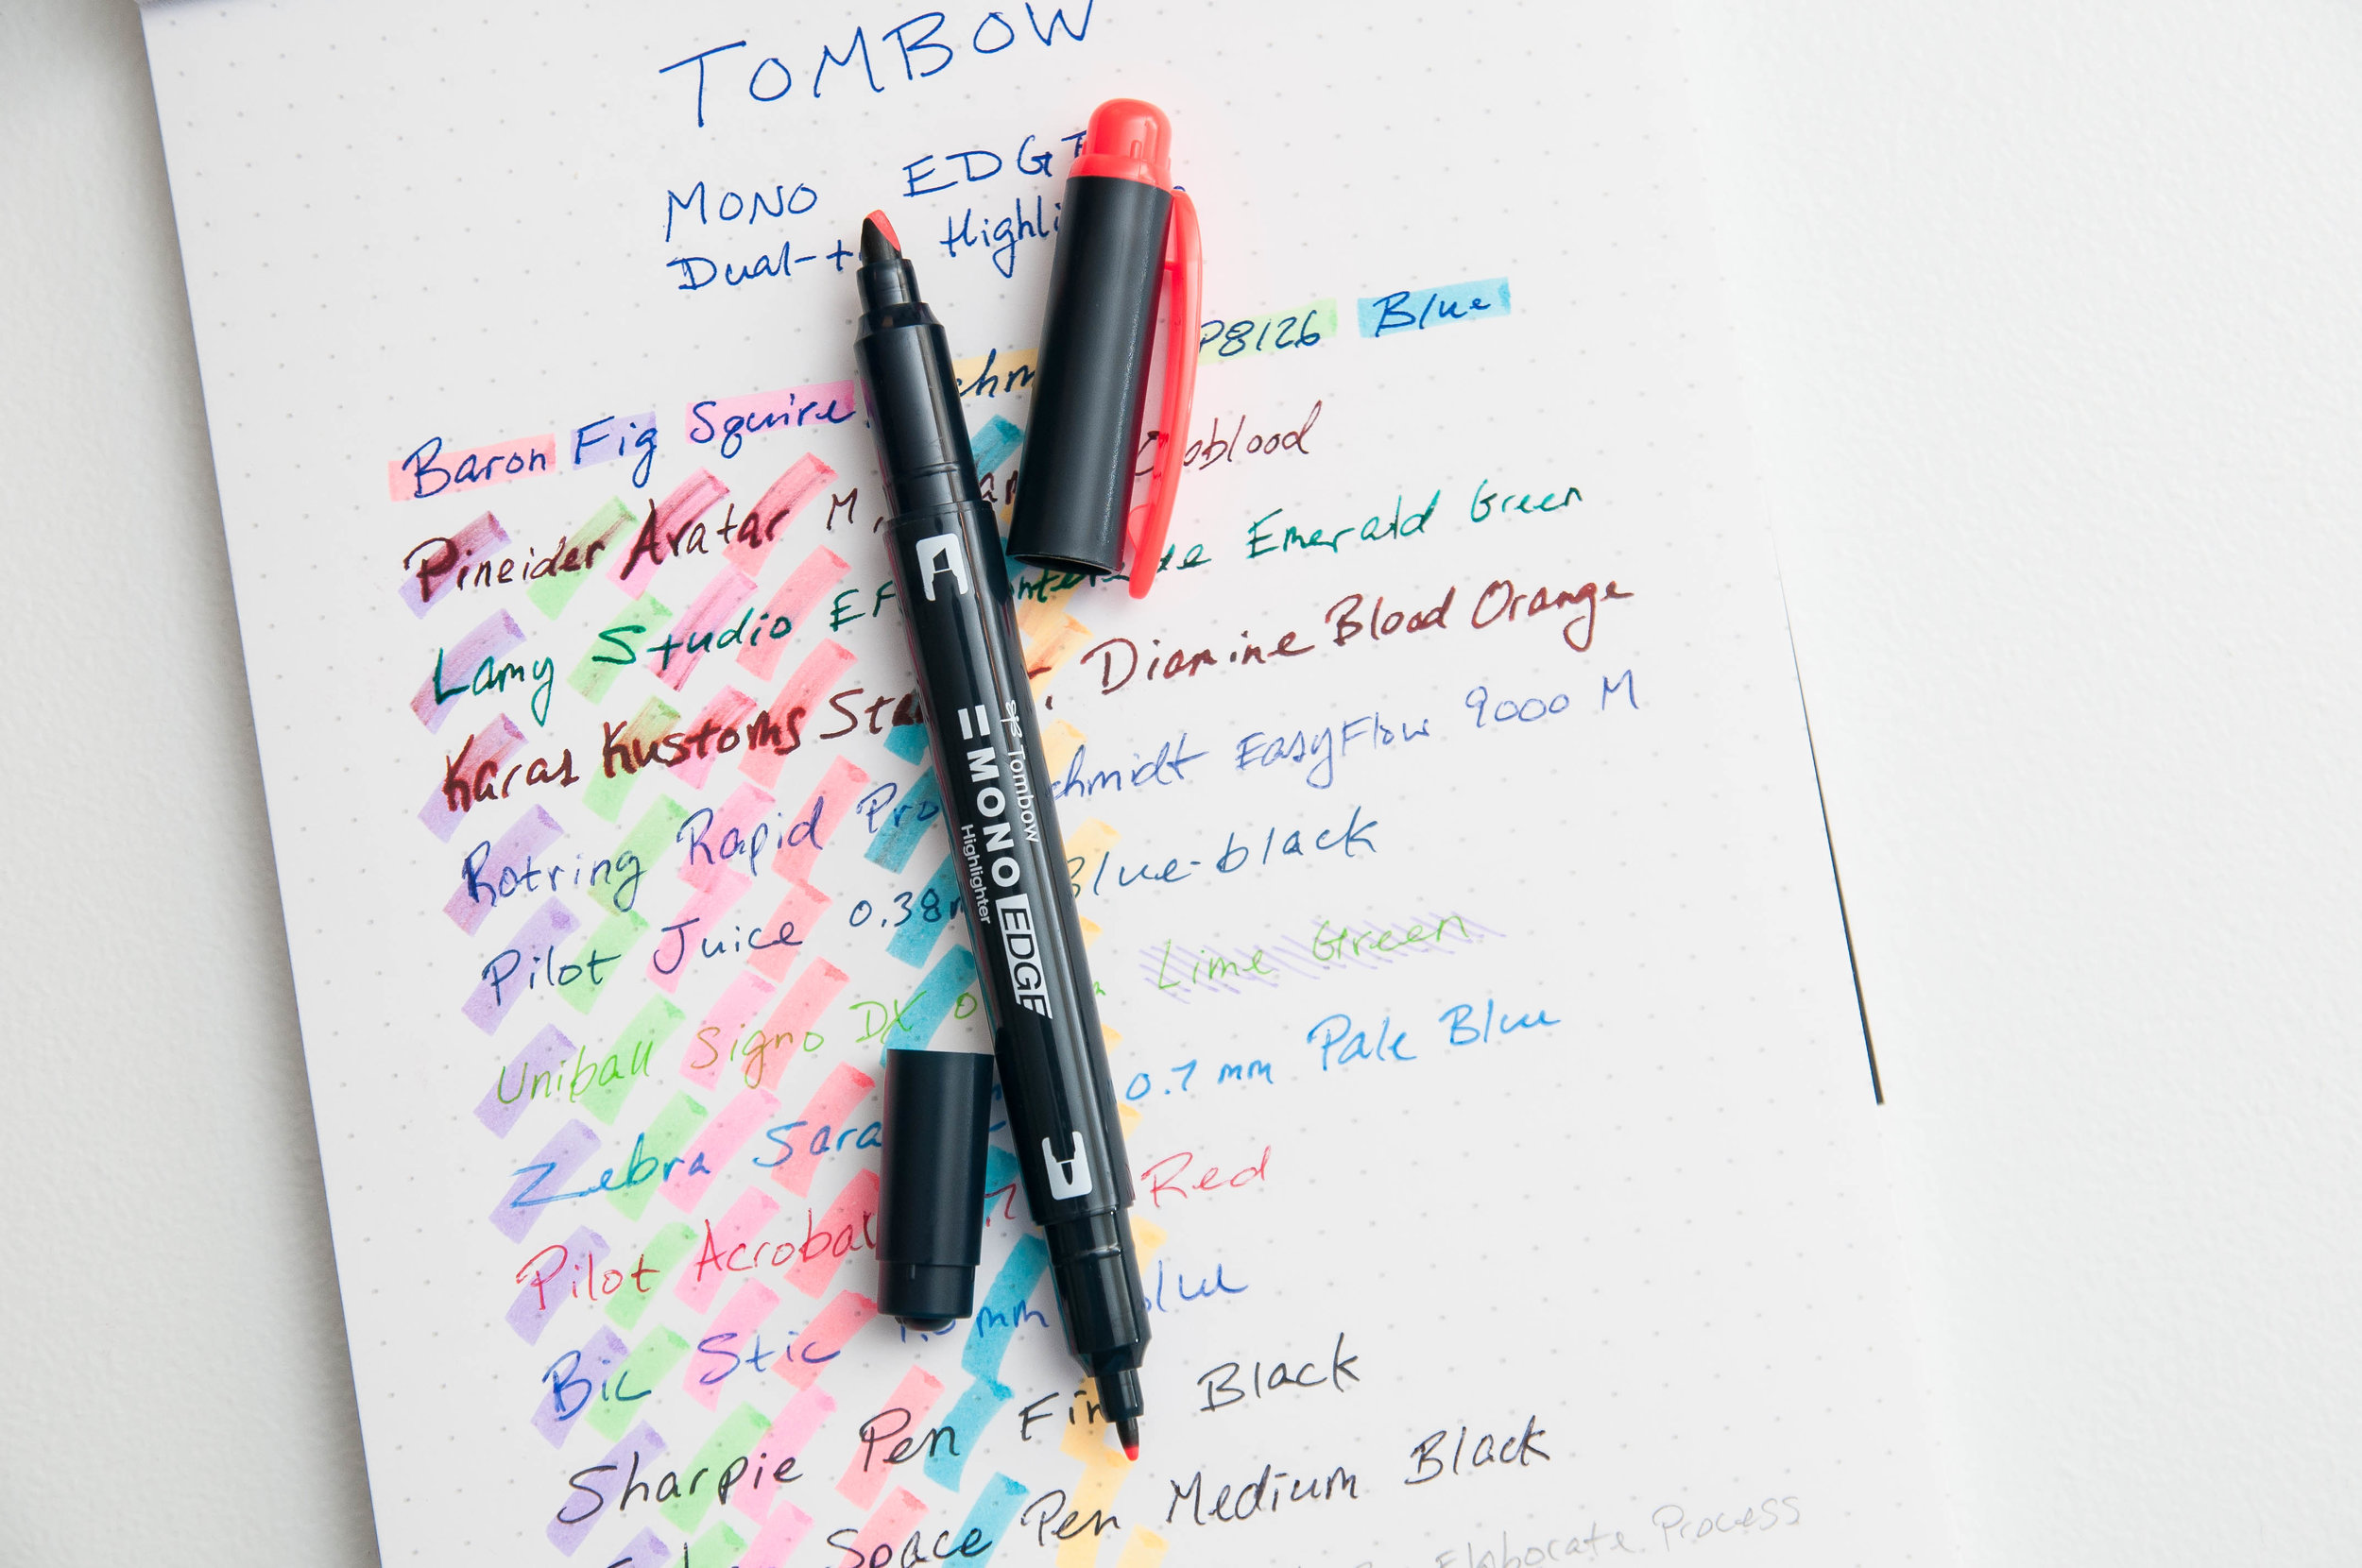 Tombow Mono Edge Dual-tip Highlighter